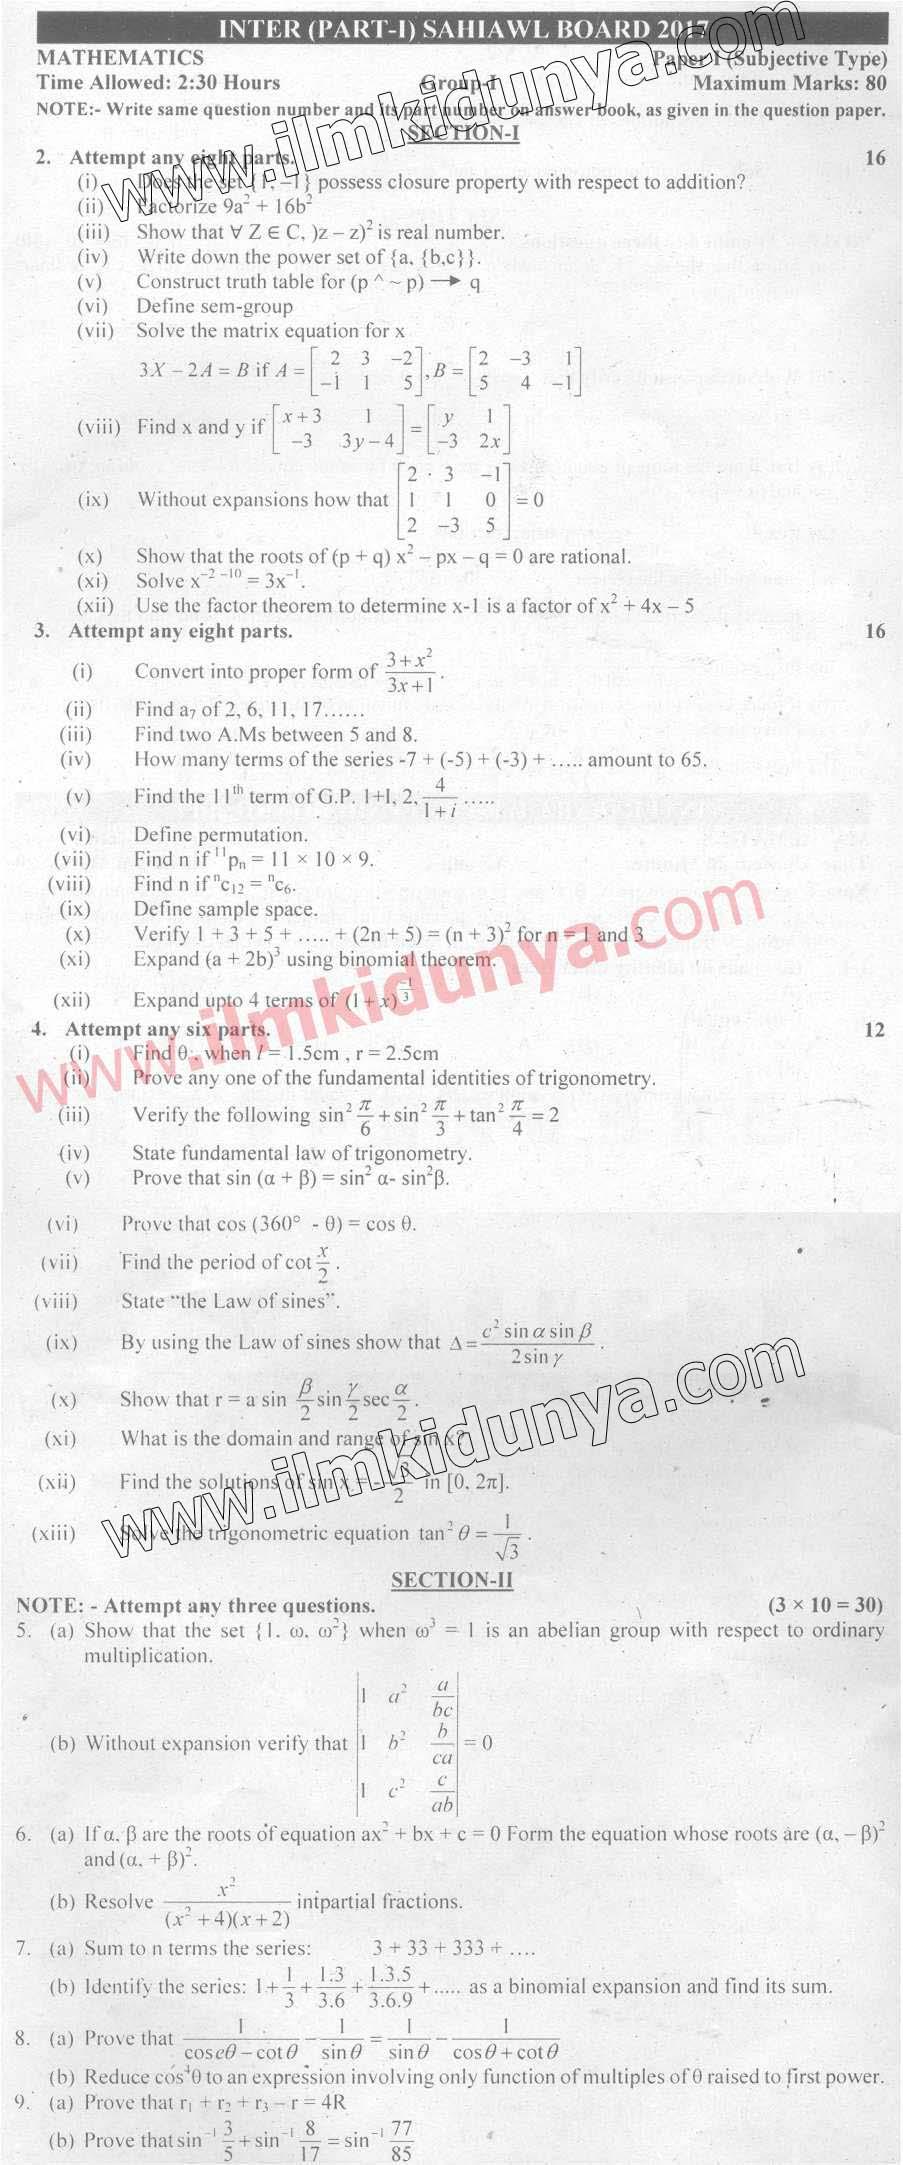 Past Papers 2017 Sahiwal Board Inter Part 1 Mathematics